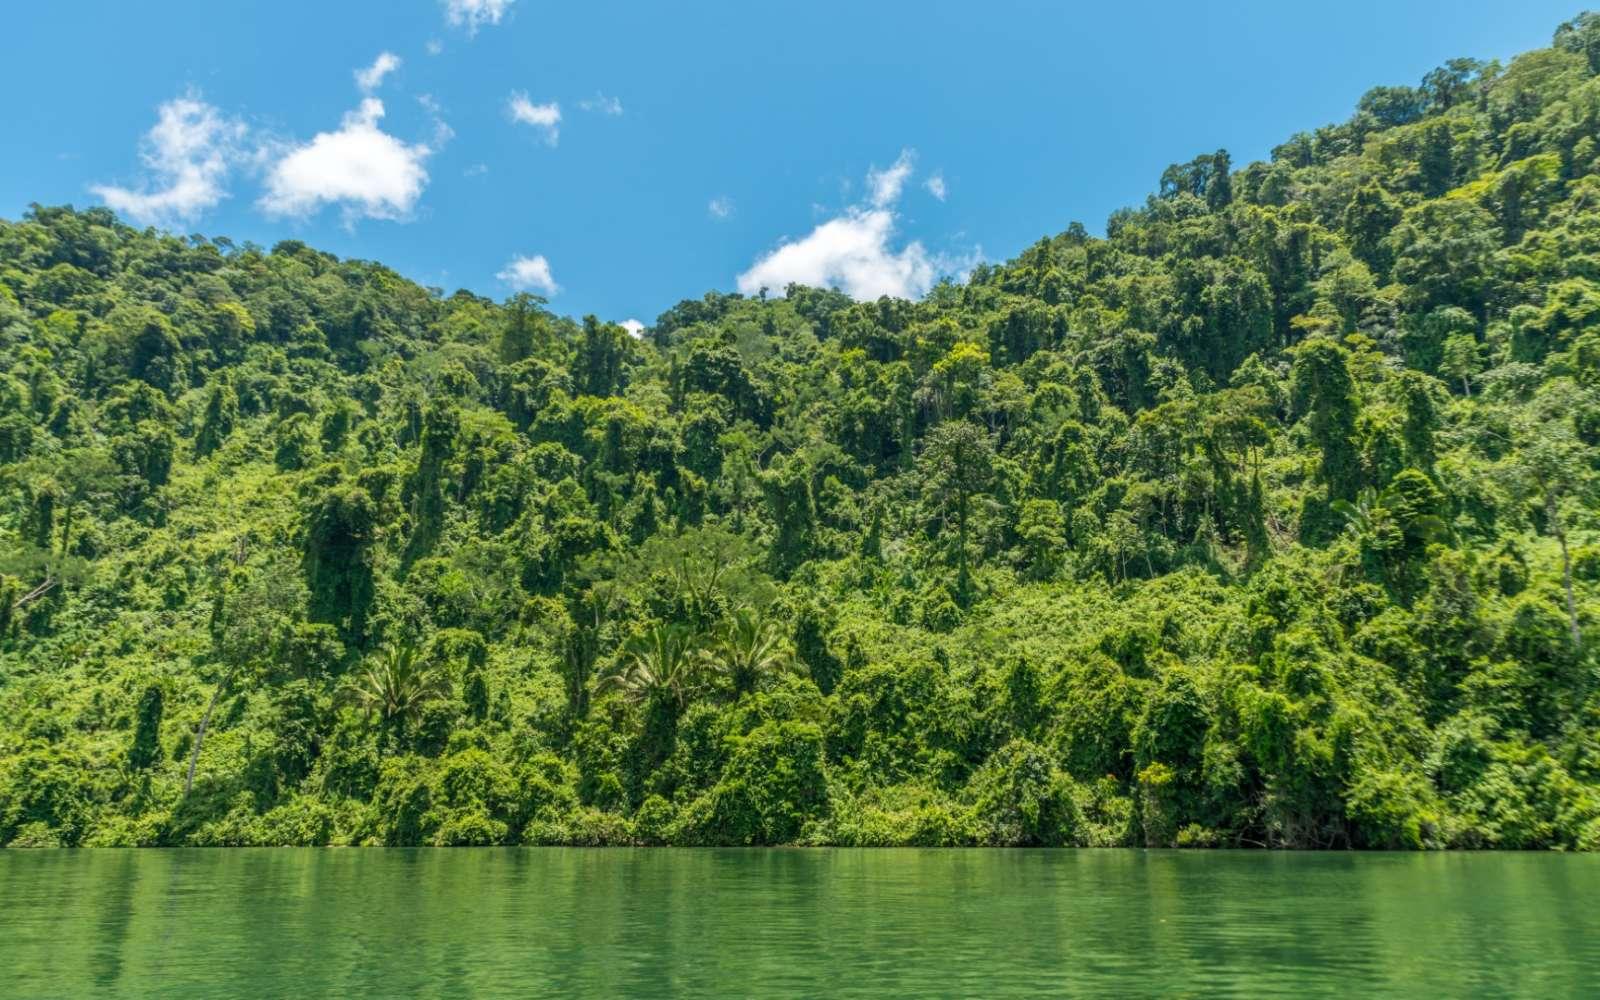 The banks of the Rio Dulce near Livingston, Guatemala